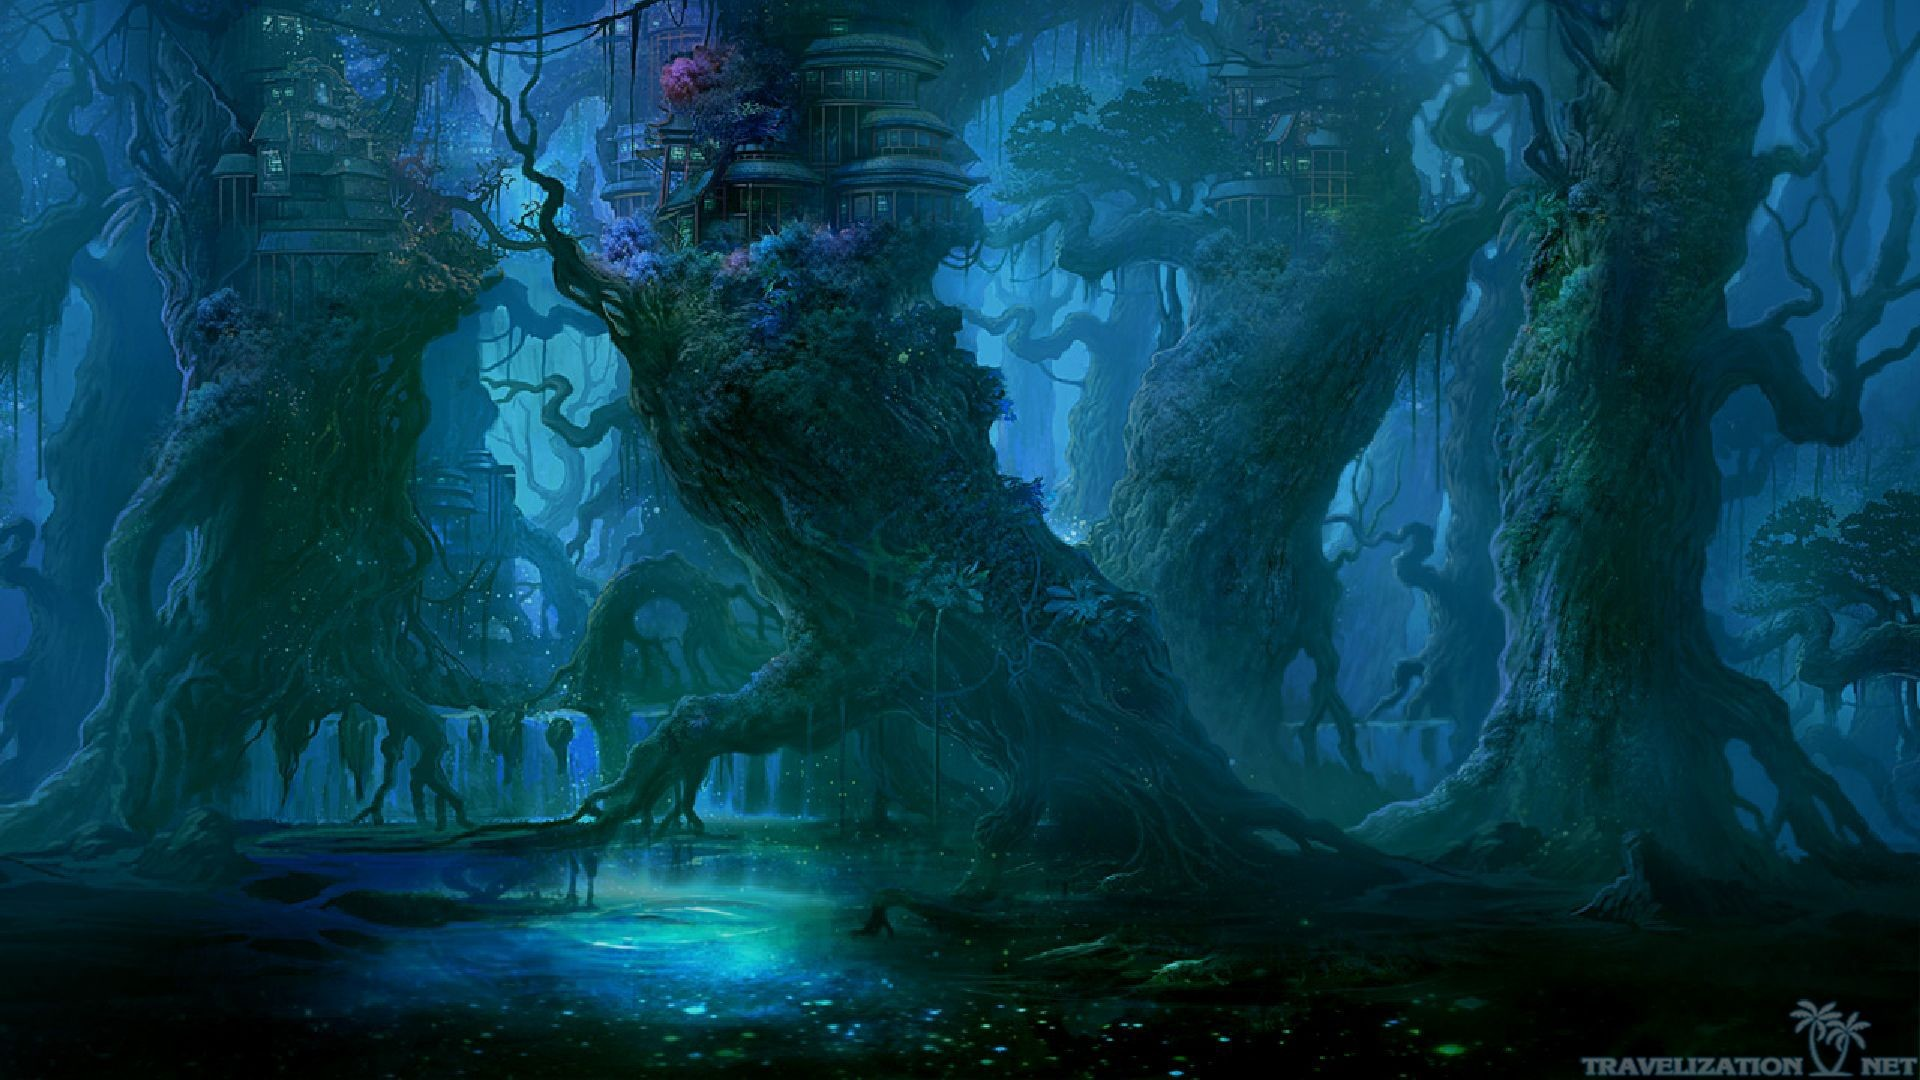 … 2560×1920. Blue Night Dark Forest Wallpapers